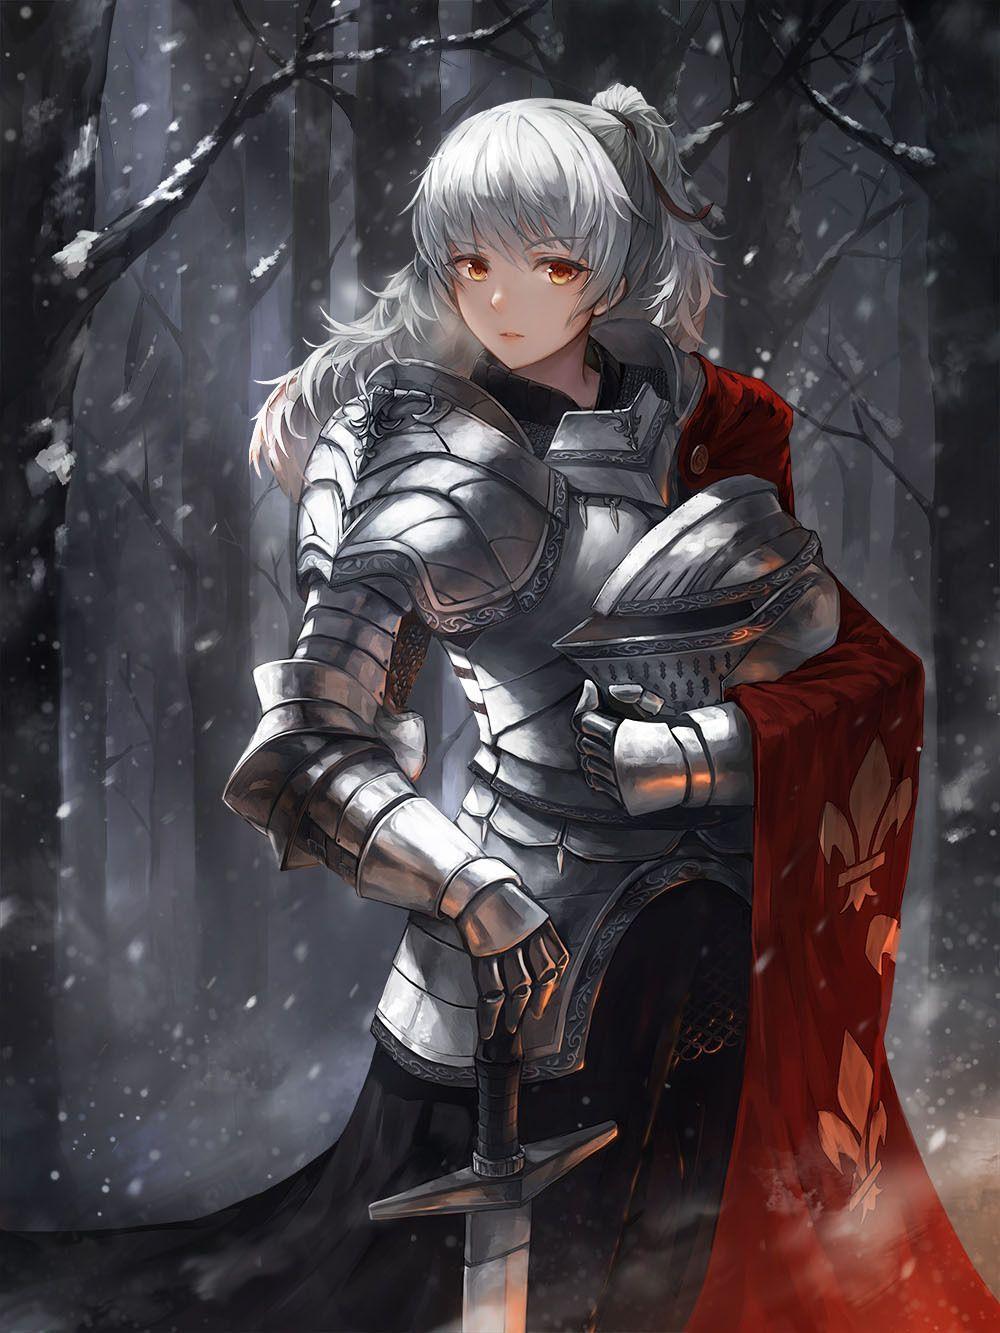 Rarts Pretty Knight Girl Original Anime Character Digital Art